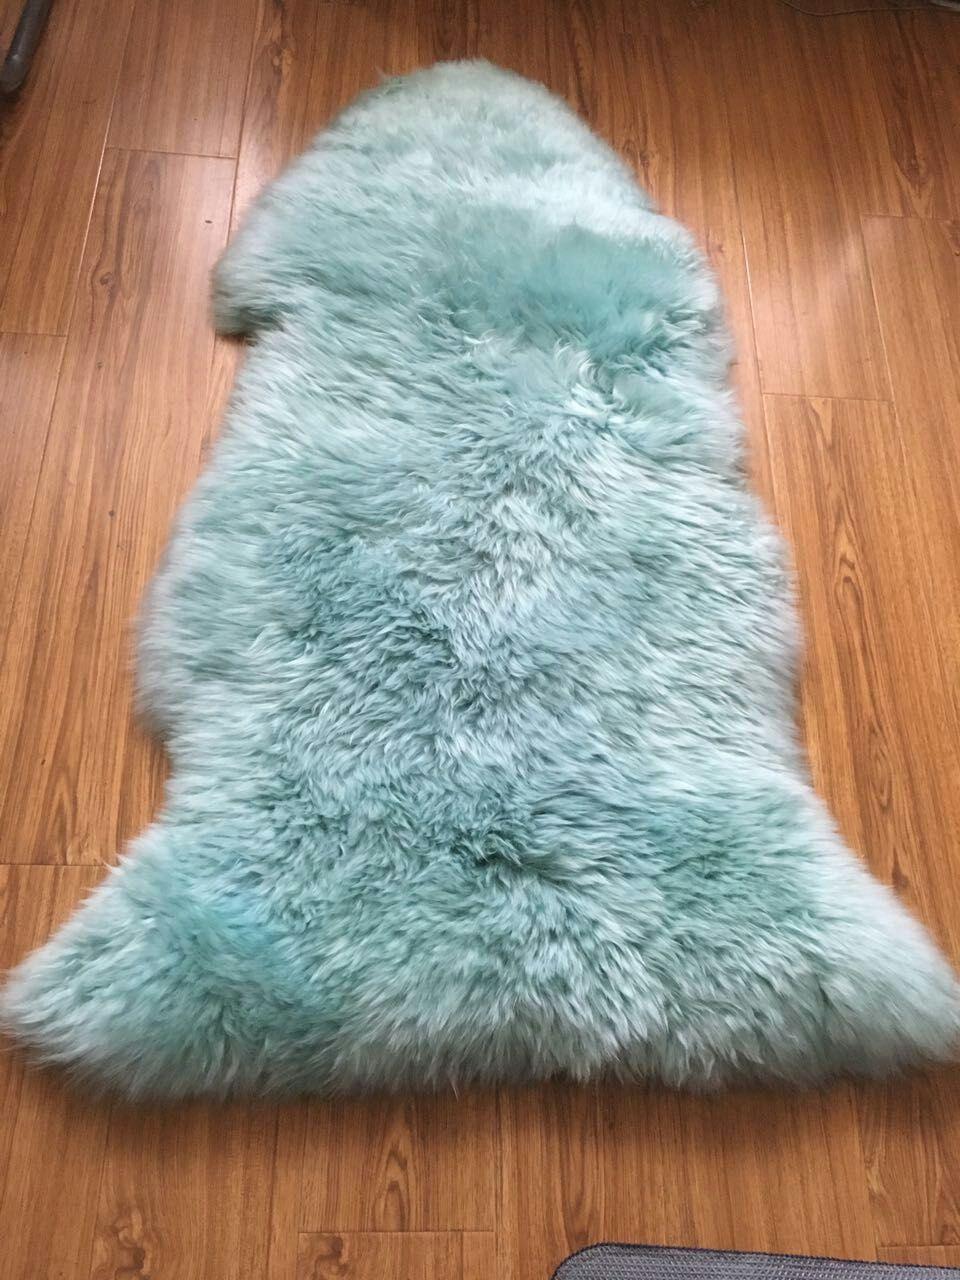 Us 57 14 20 Off Pea Blue Single Pelt Real Sheepskin Rug Australia Wool Genuine Fur For Home Bedroom Chair Cover Sofa Mat In